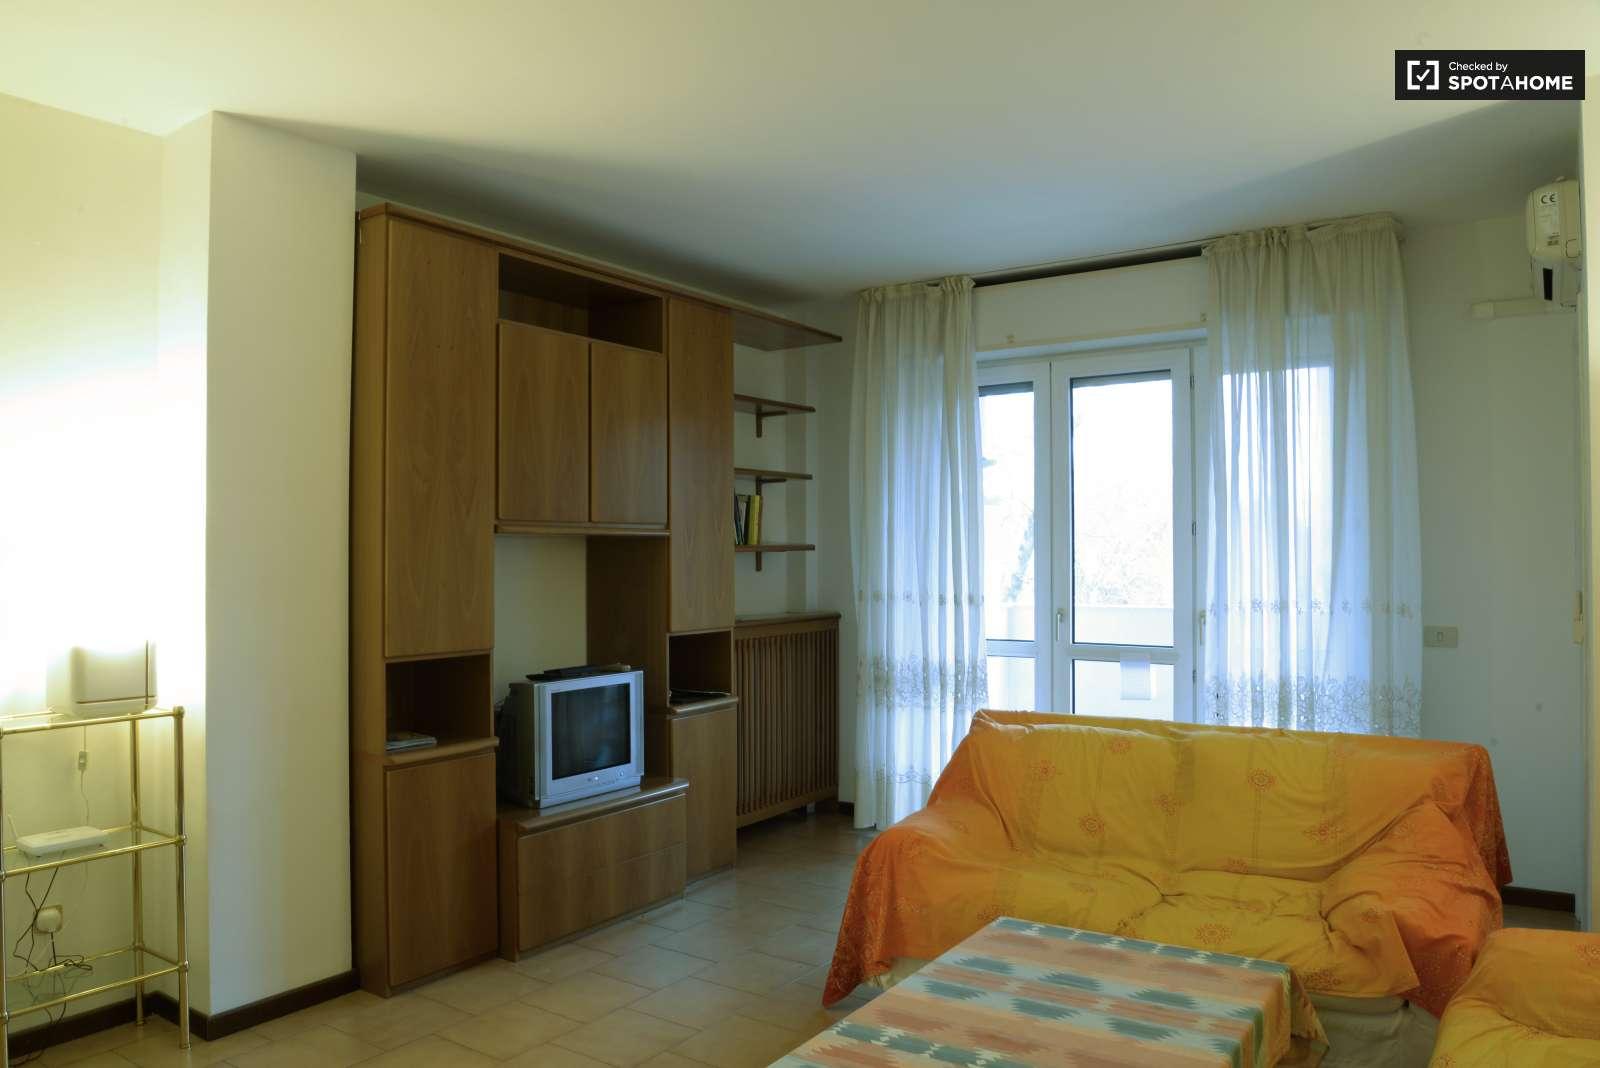 Single Bedrooms Single Bed In 3 Single Bedrooms For Rent In San Siro Close To